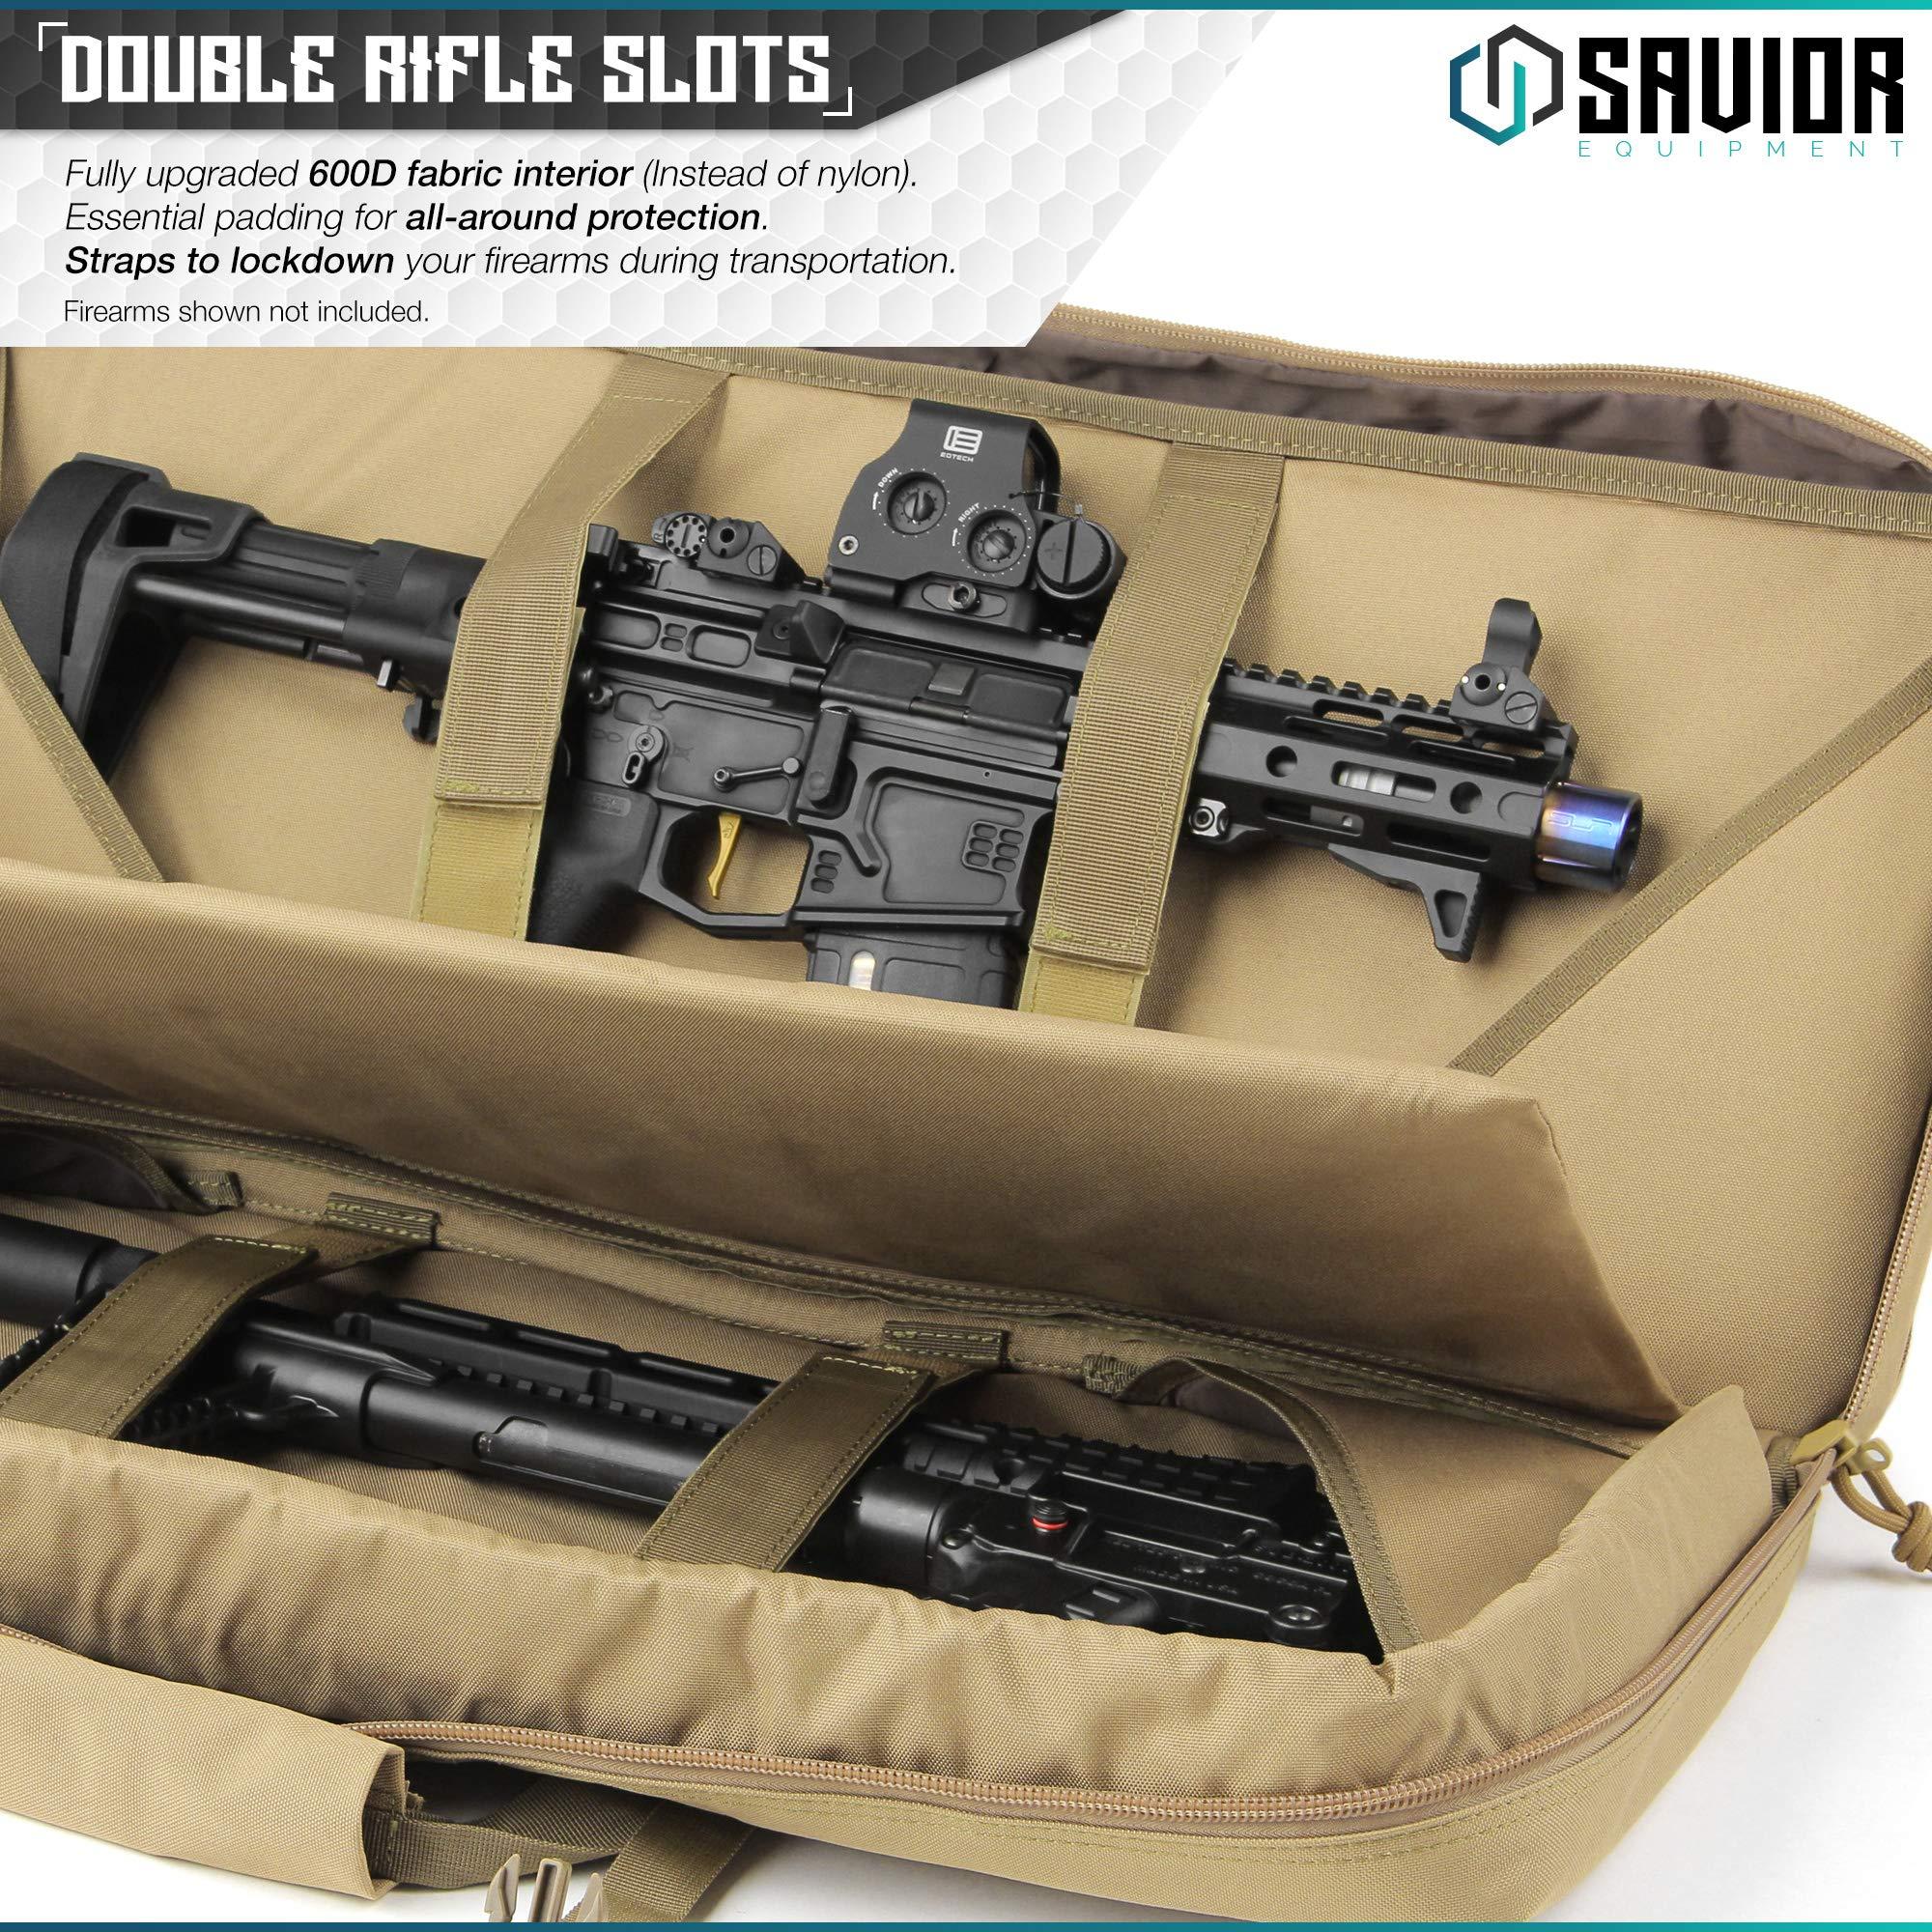 Savior Equipment American Classic Tactical Double Short Barrel Rifle Gun Case Firearm Bag - Suitable for Subgun Bullpups Carbine Shotgun SMG SBR AR AK Pistol, Available Length in 24'' 28'' 32'' by Savior Equipment (Image #2)